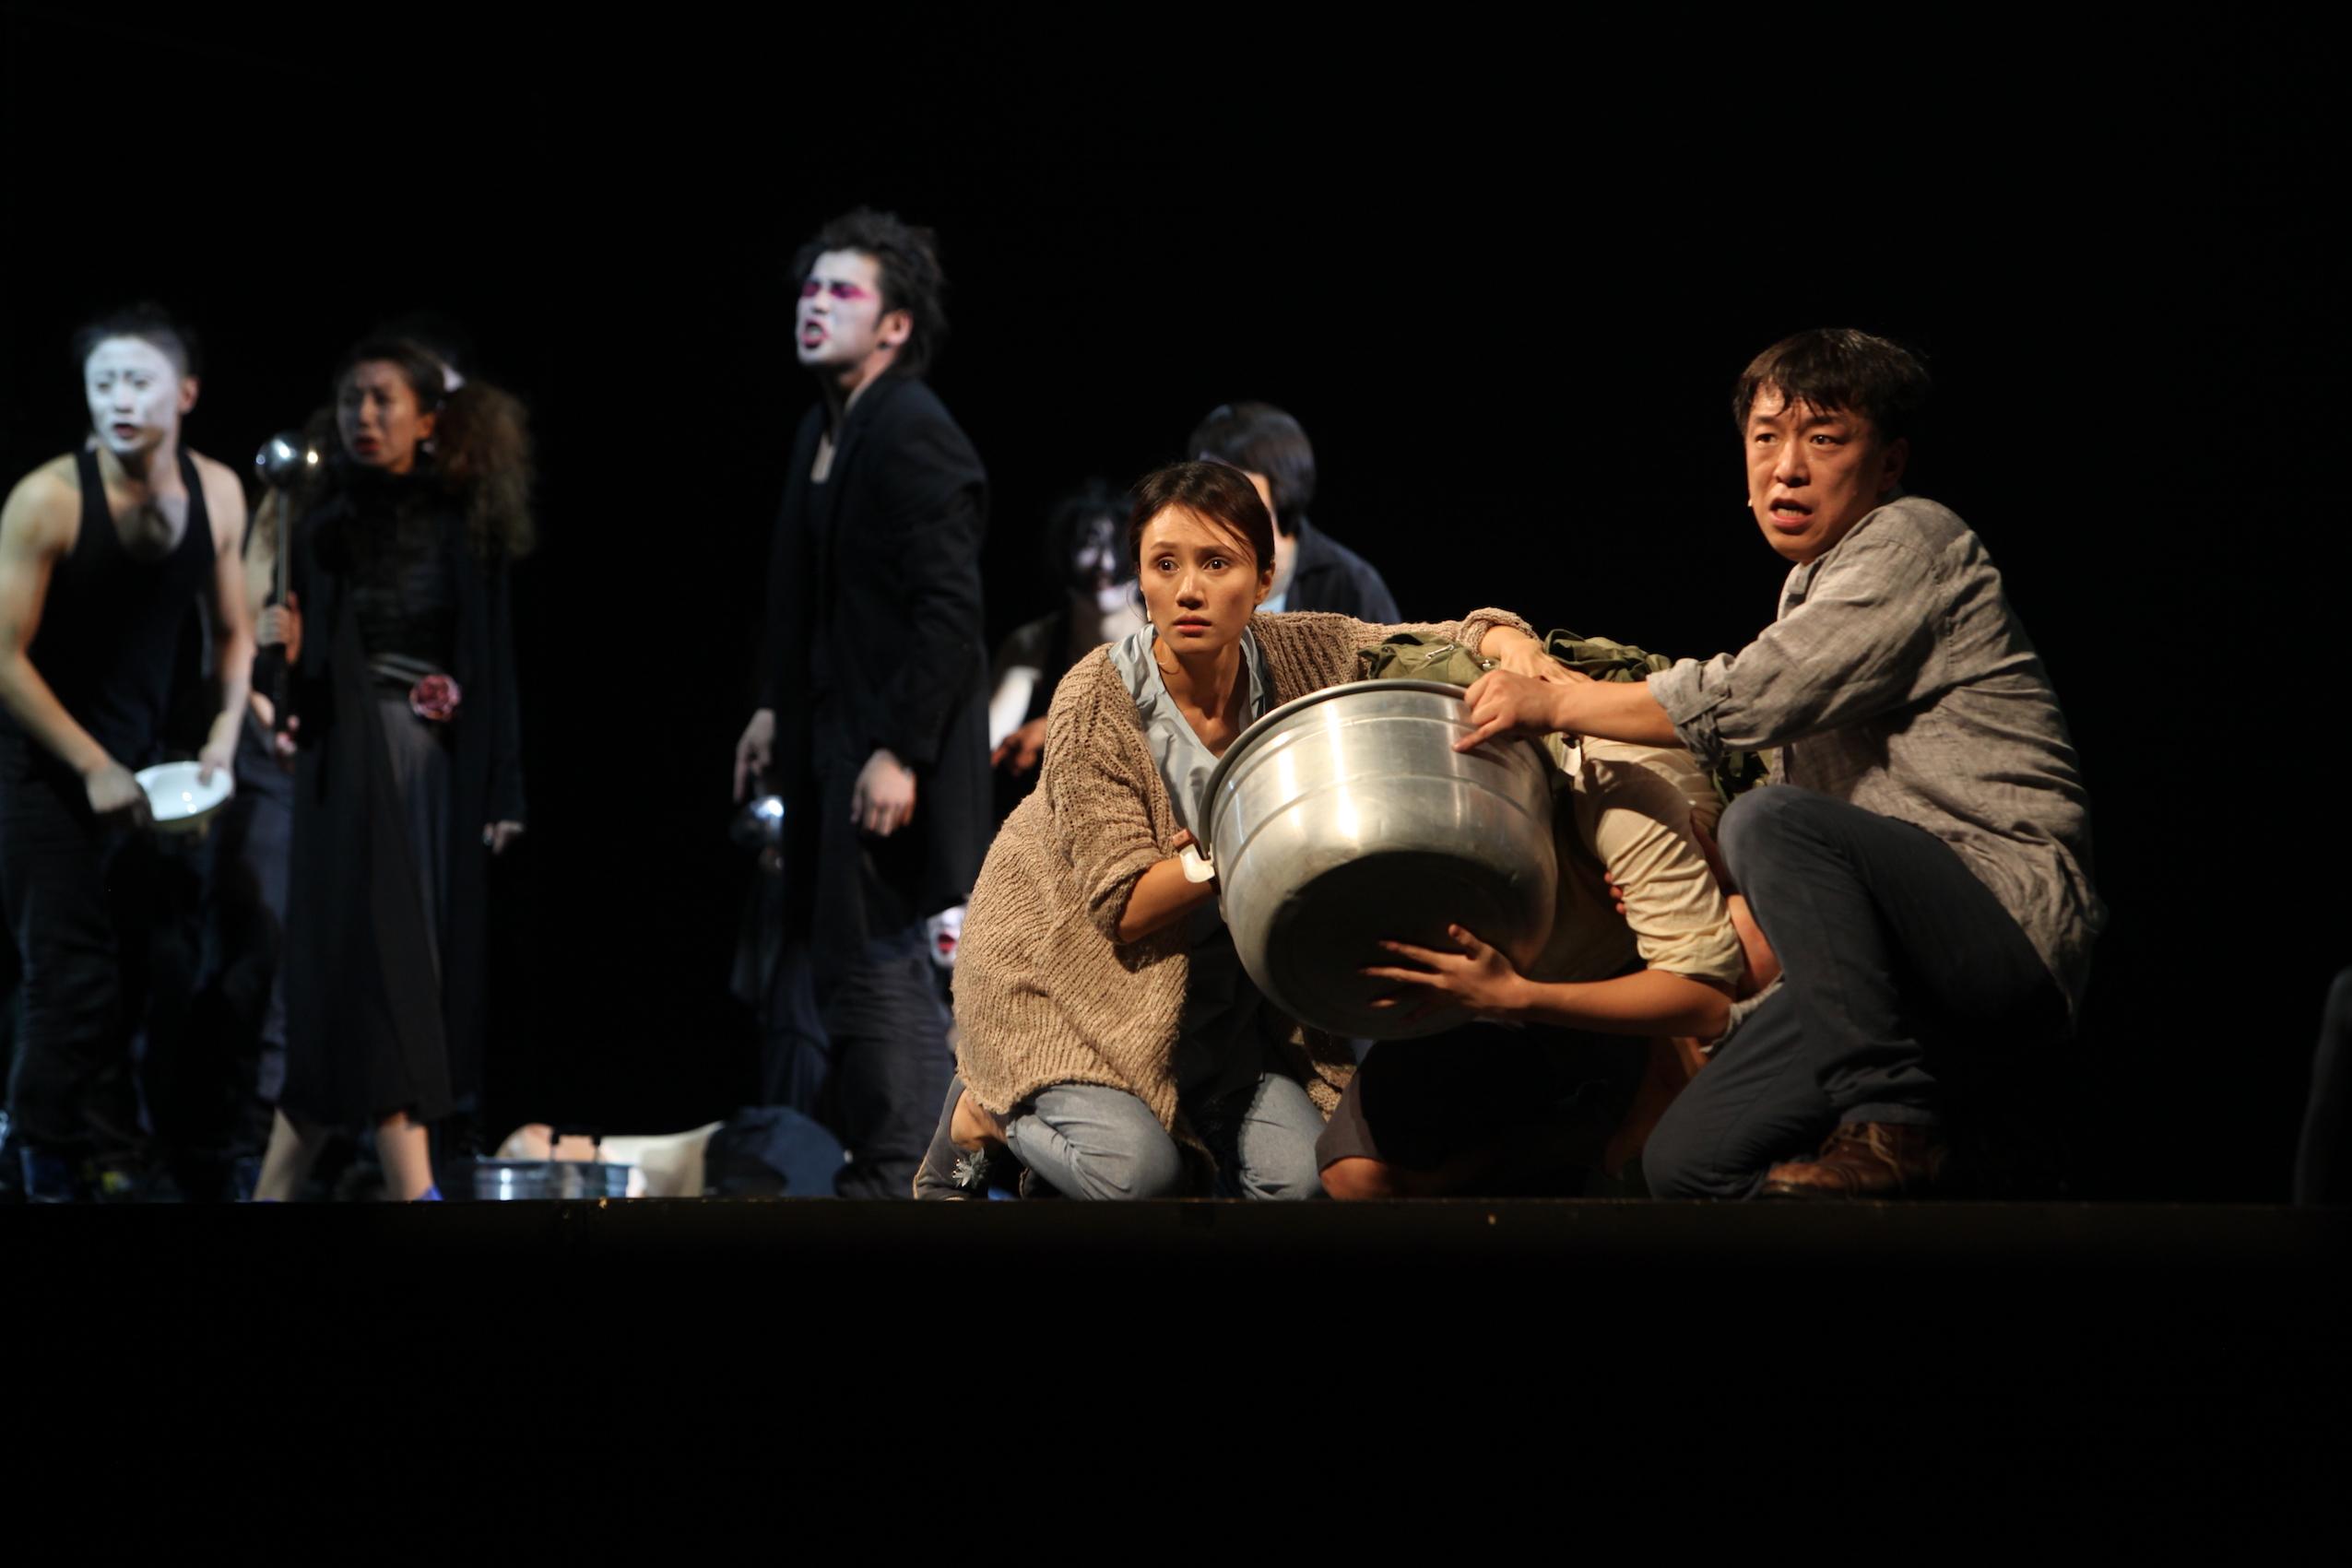 4vivre-de-meng-jinghui-2012-meng-jinghui-studio-2